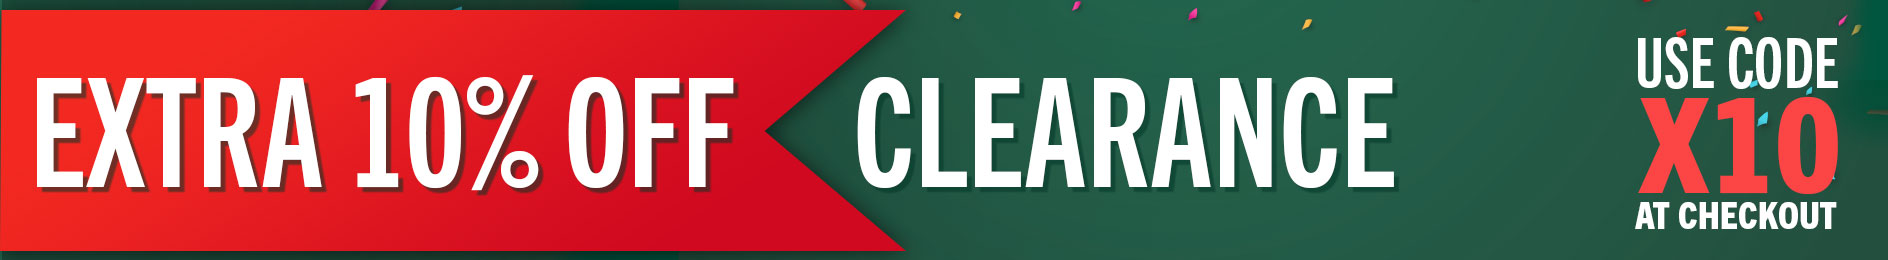 online-banner-clearance.jpg